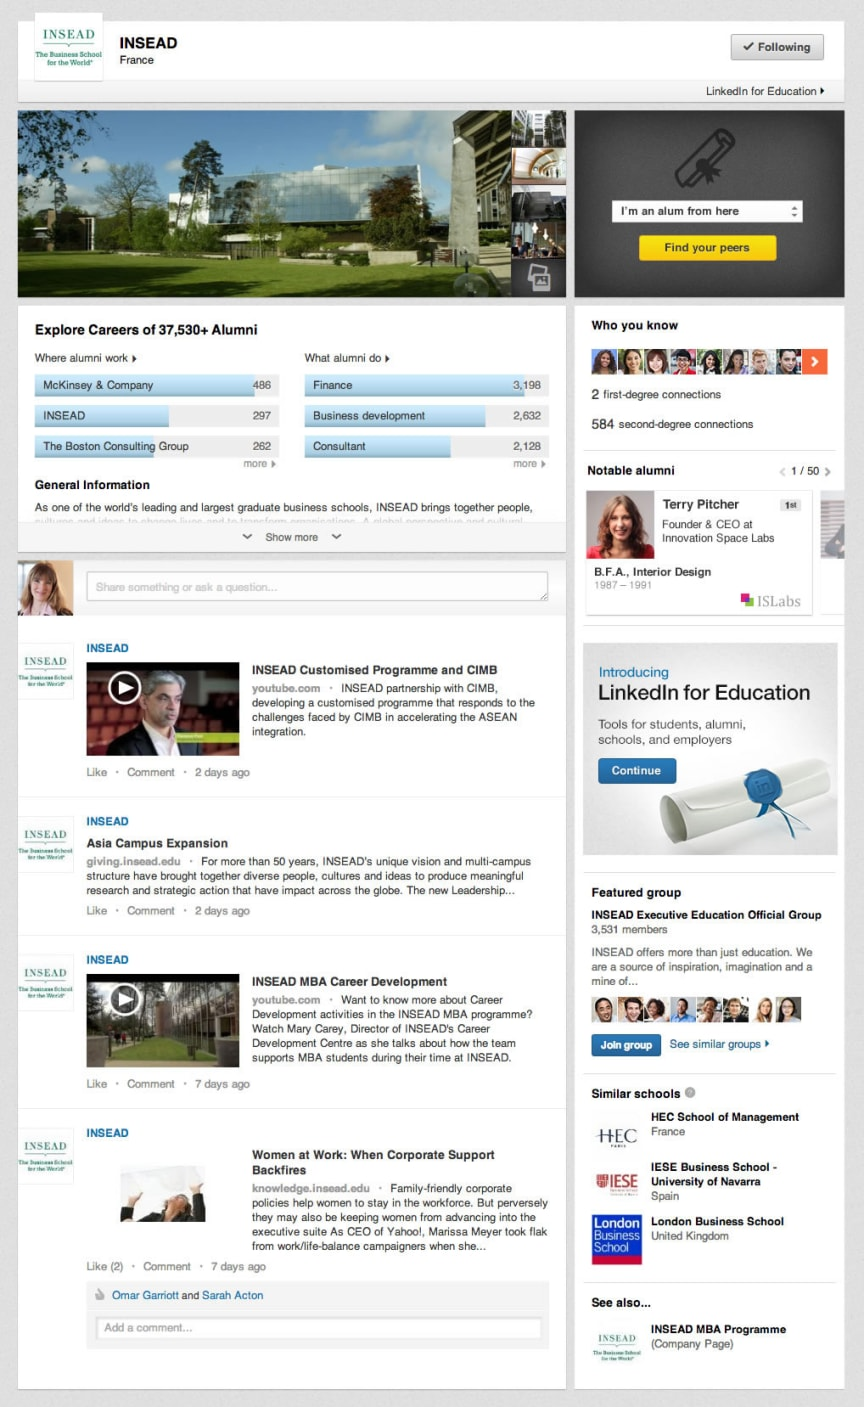 INSEAD University Page